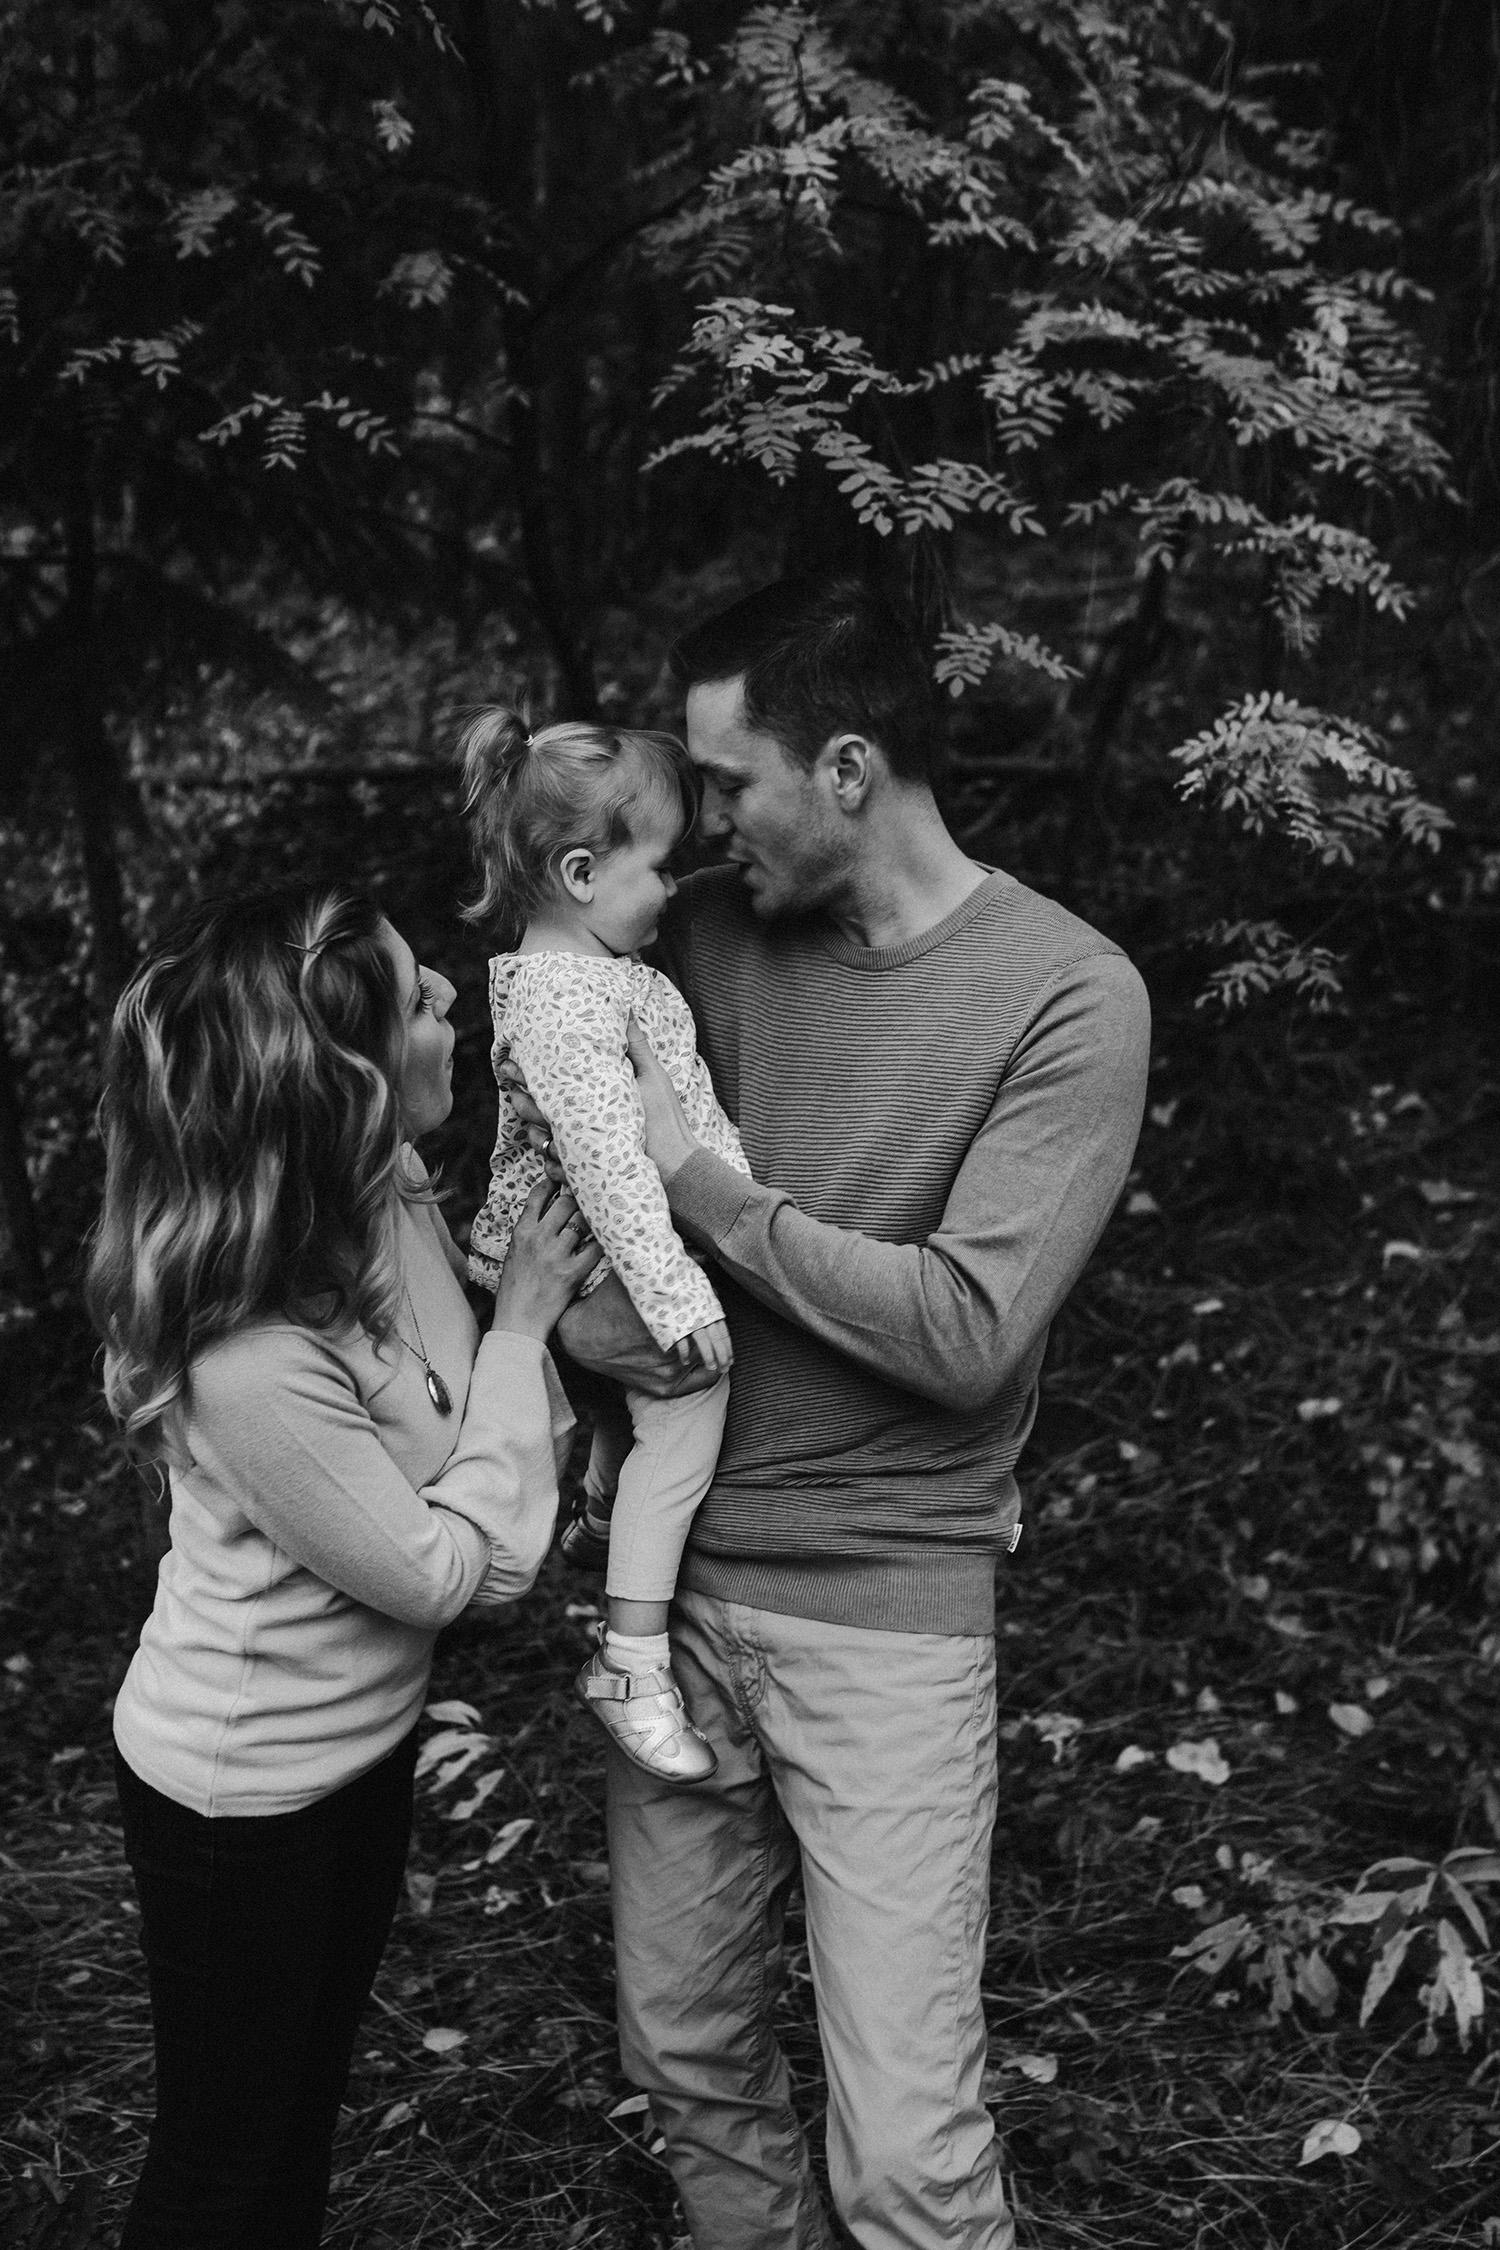 mission creek family photos kelowna